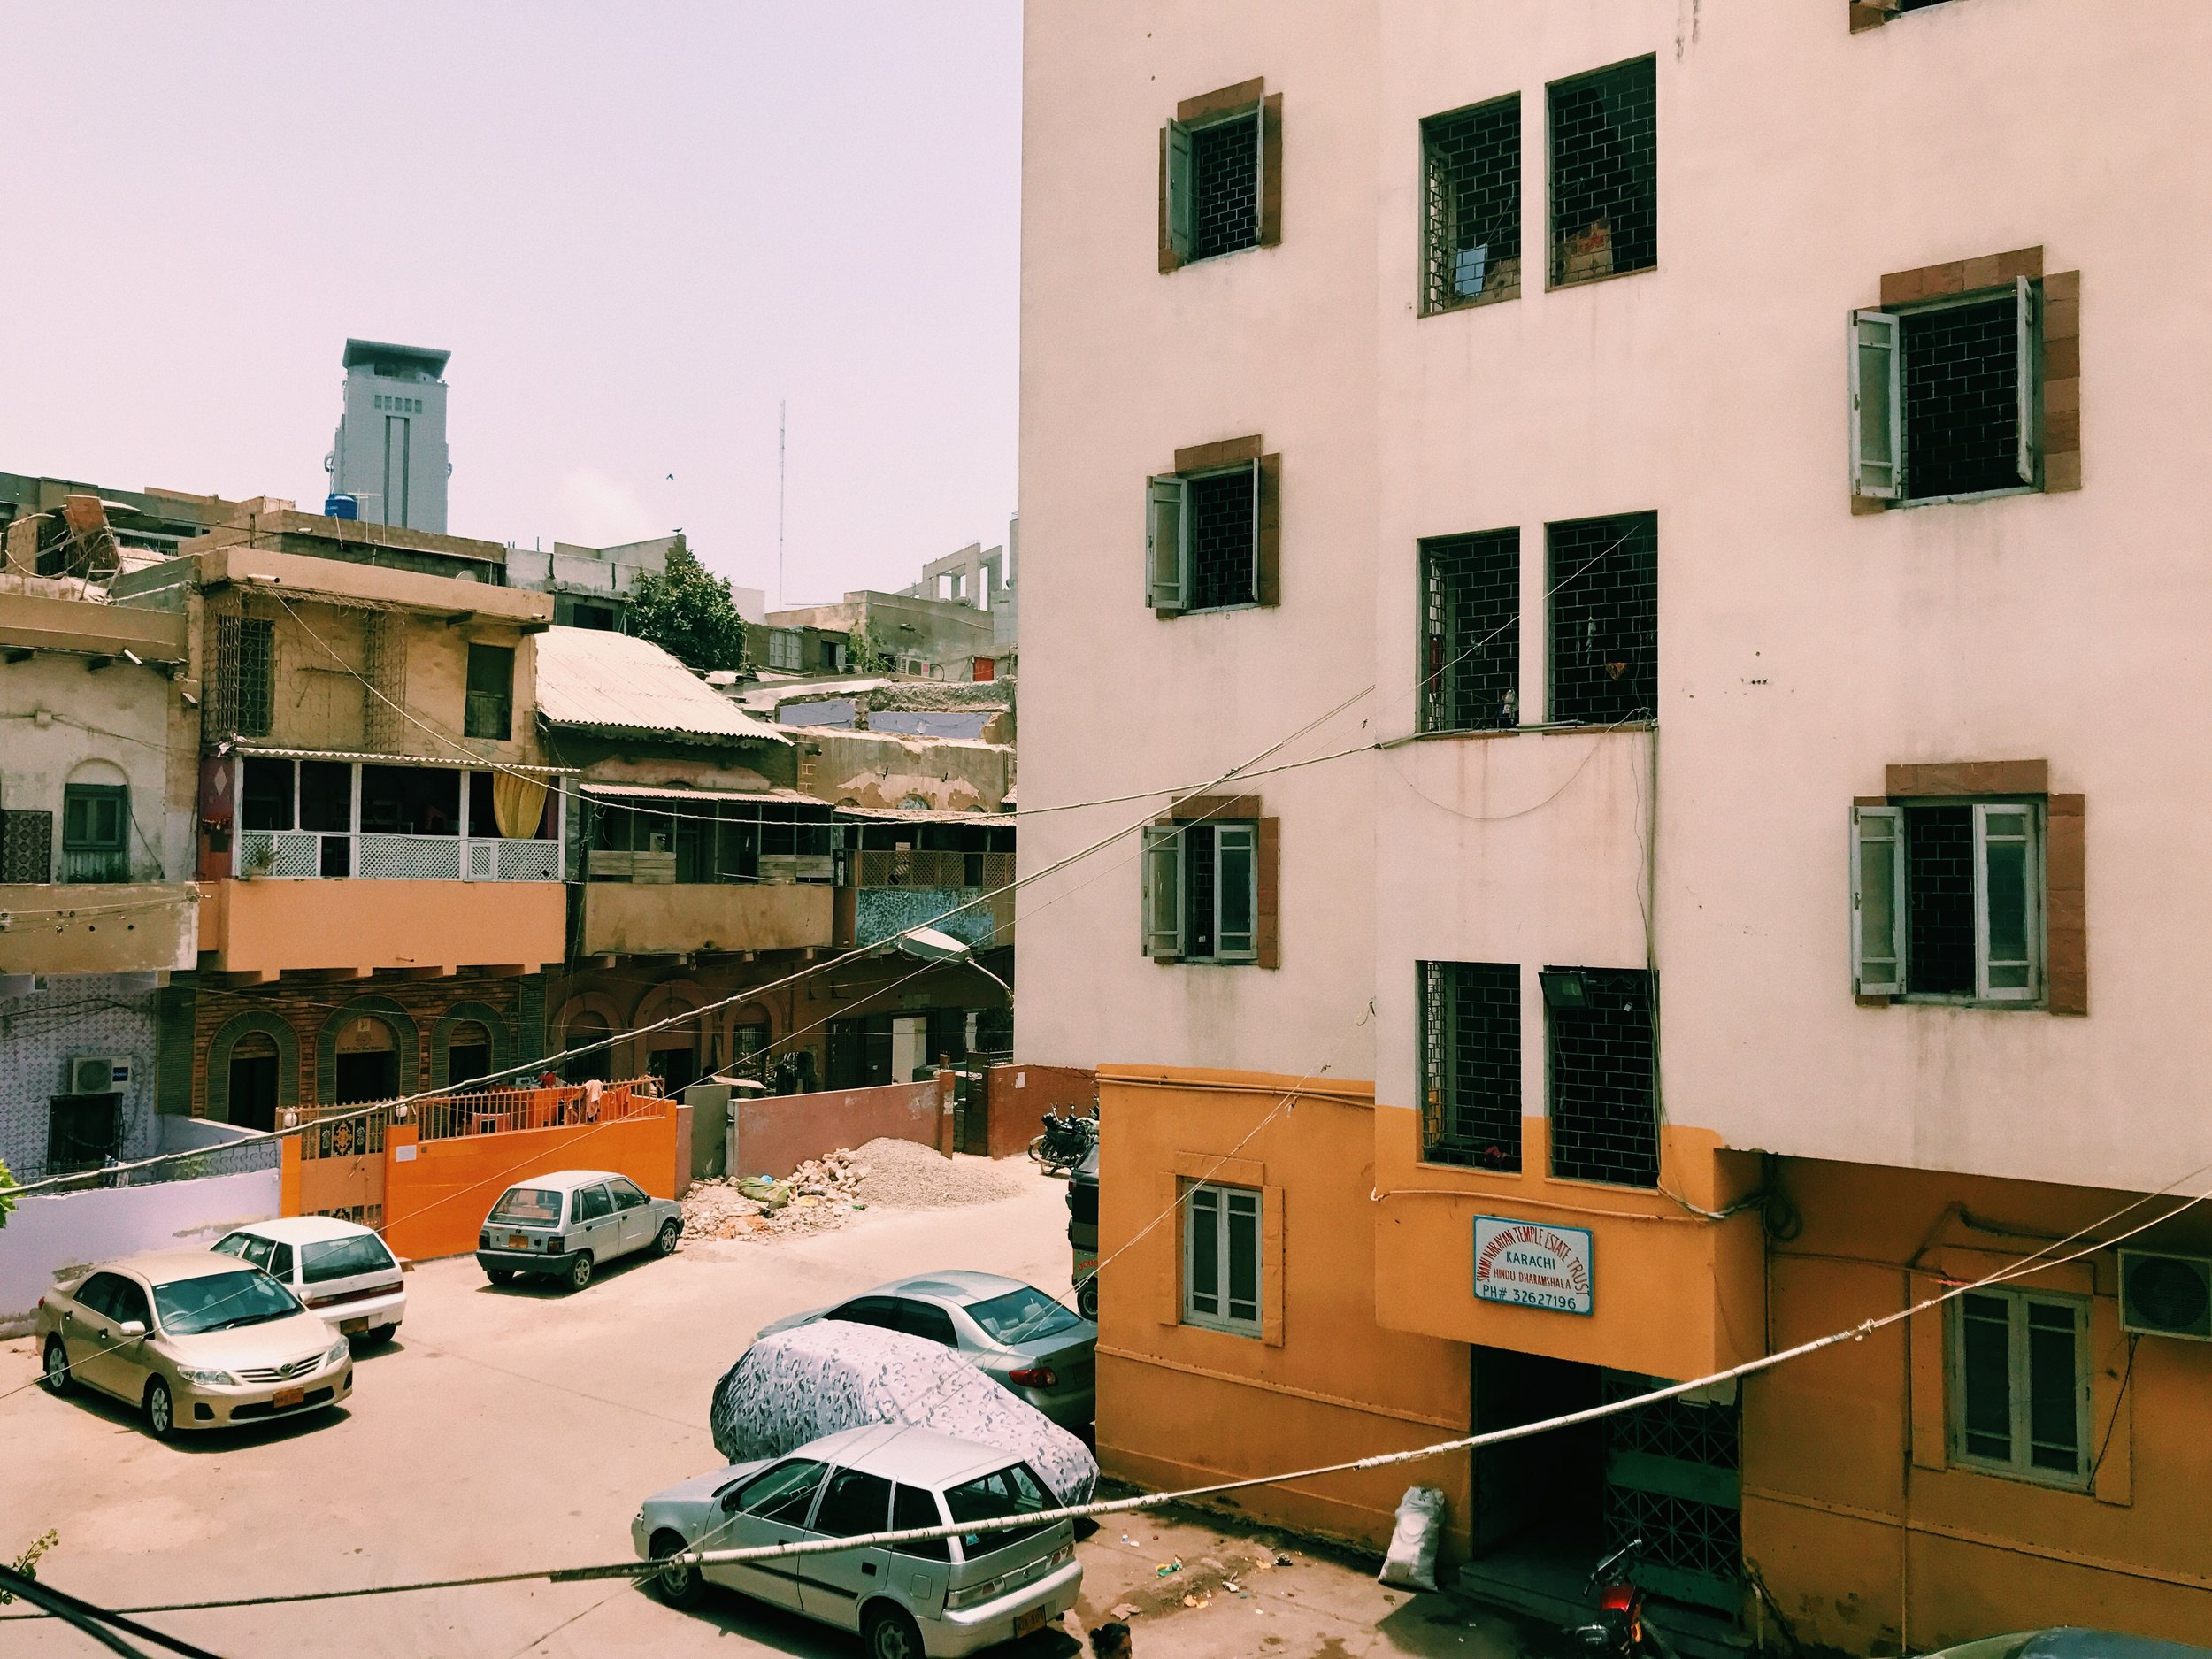 Mixtape for the city - By Fatima JafarMarch 1, 2019 ・ 10 mins.